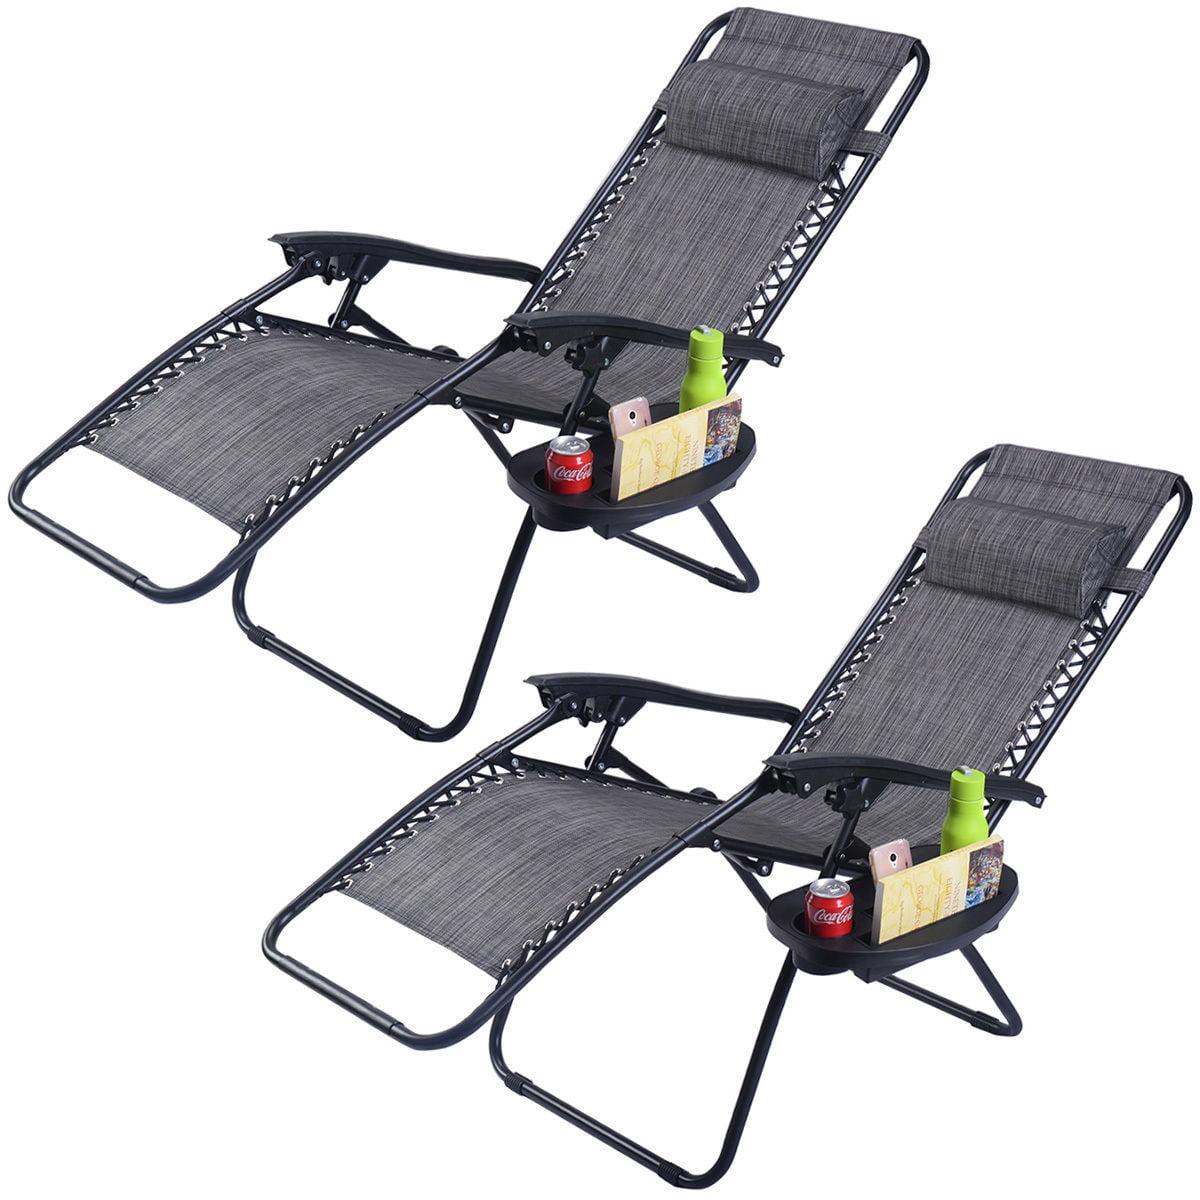 2PC Folding Zero Gravity Reclining Lounge Chairs Beach Patio W Utility Tray